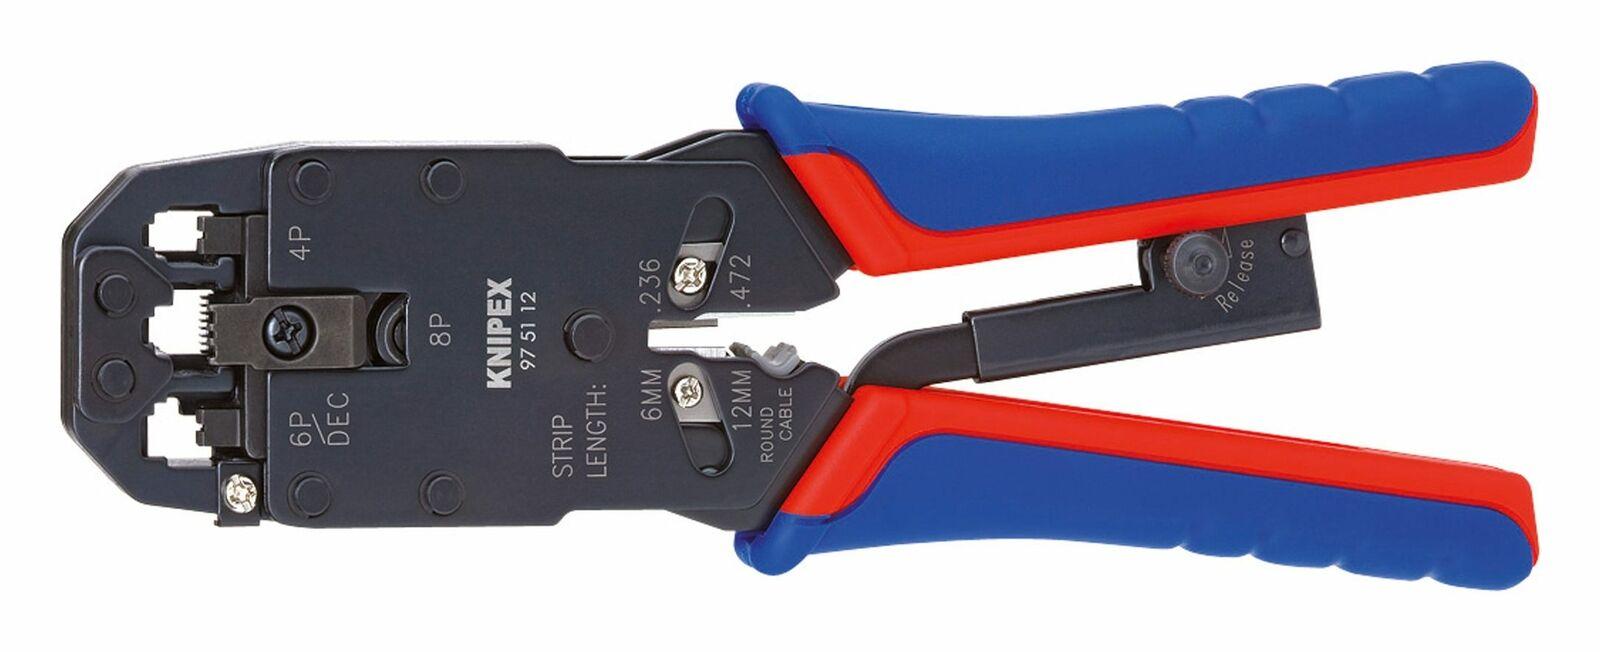 Knipex Crimp-Hebelzange 4 6 8-polig Western - 97 51 12